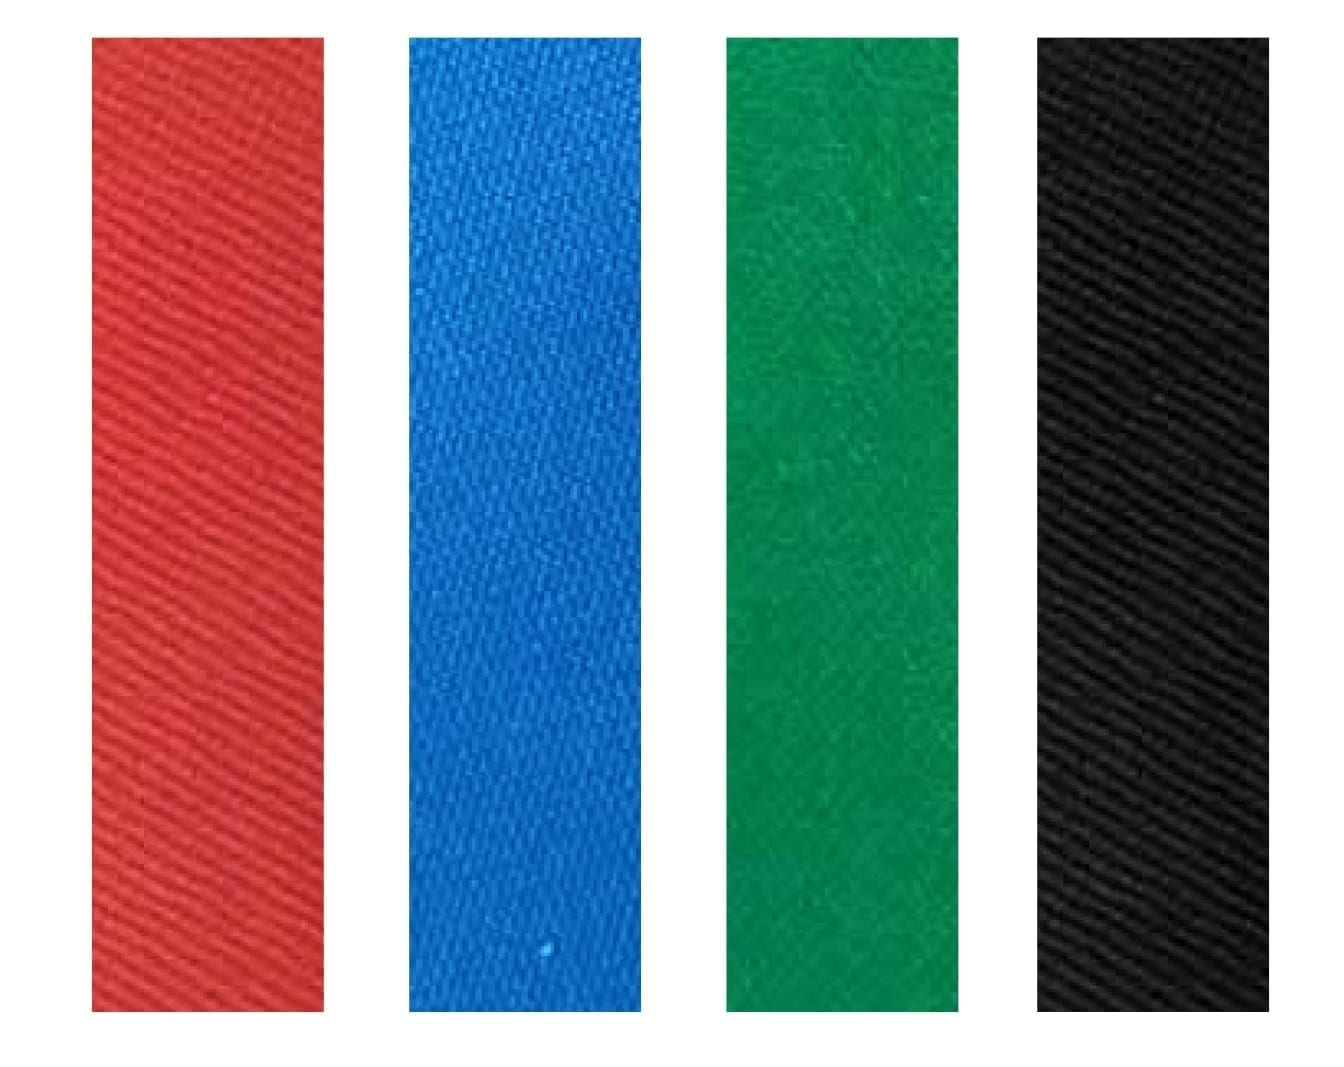 Teltfarger - Allprofil AS - Trykksaker - Profilering - Klær - Digital skilting - Tjenester - Kontakt